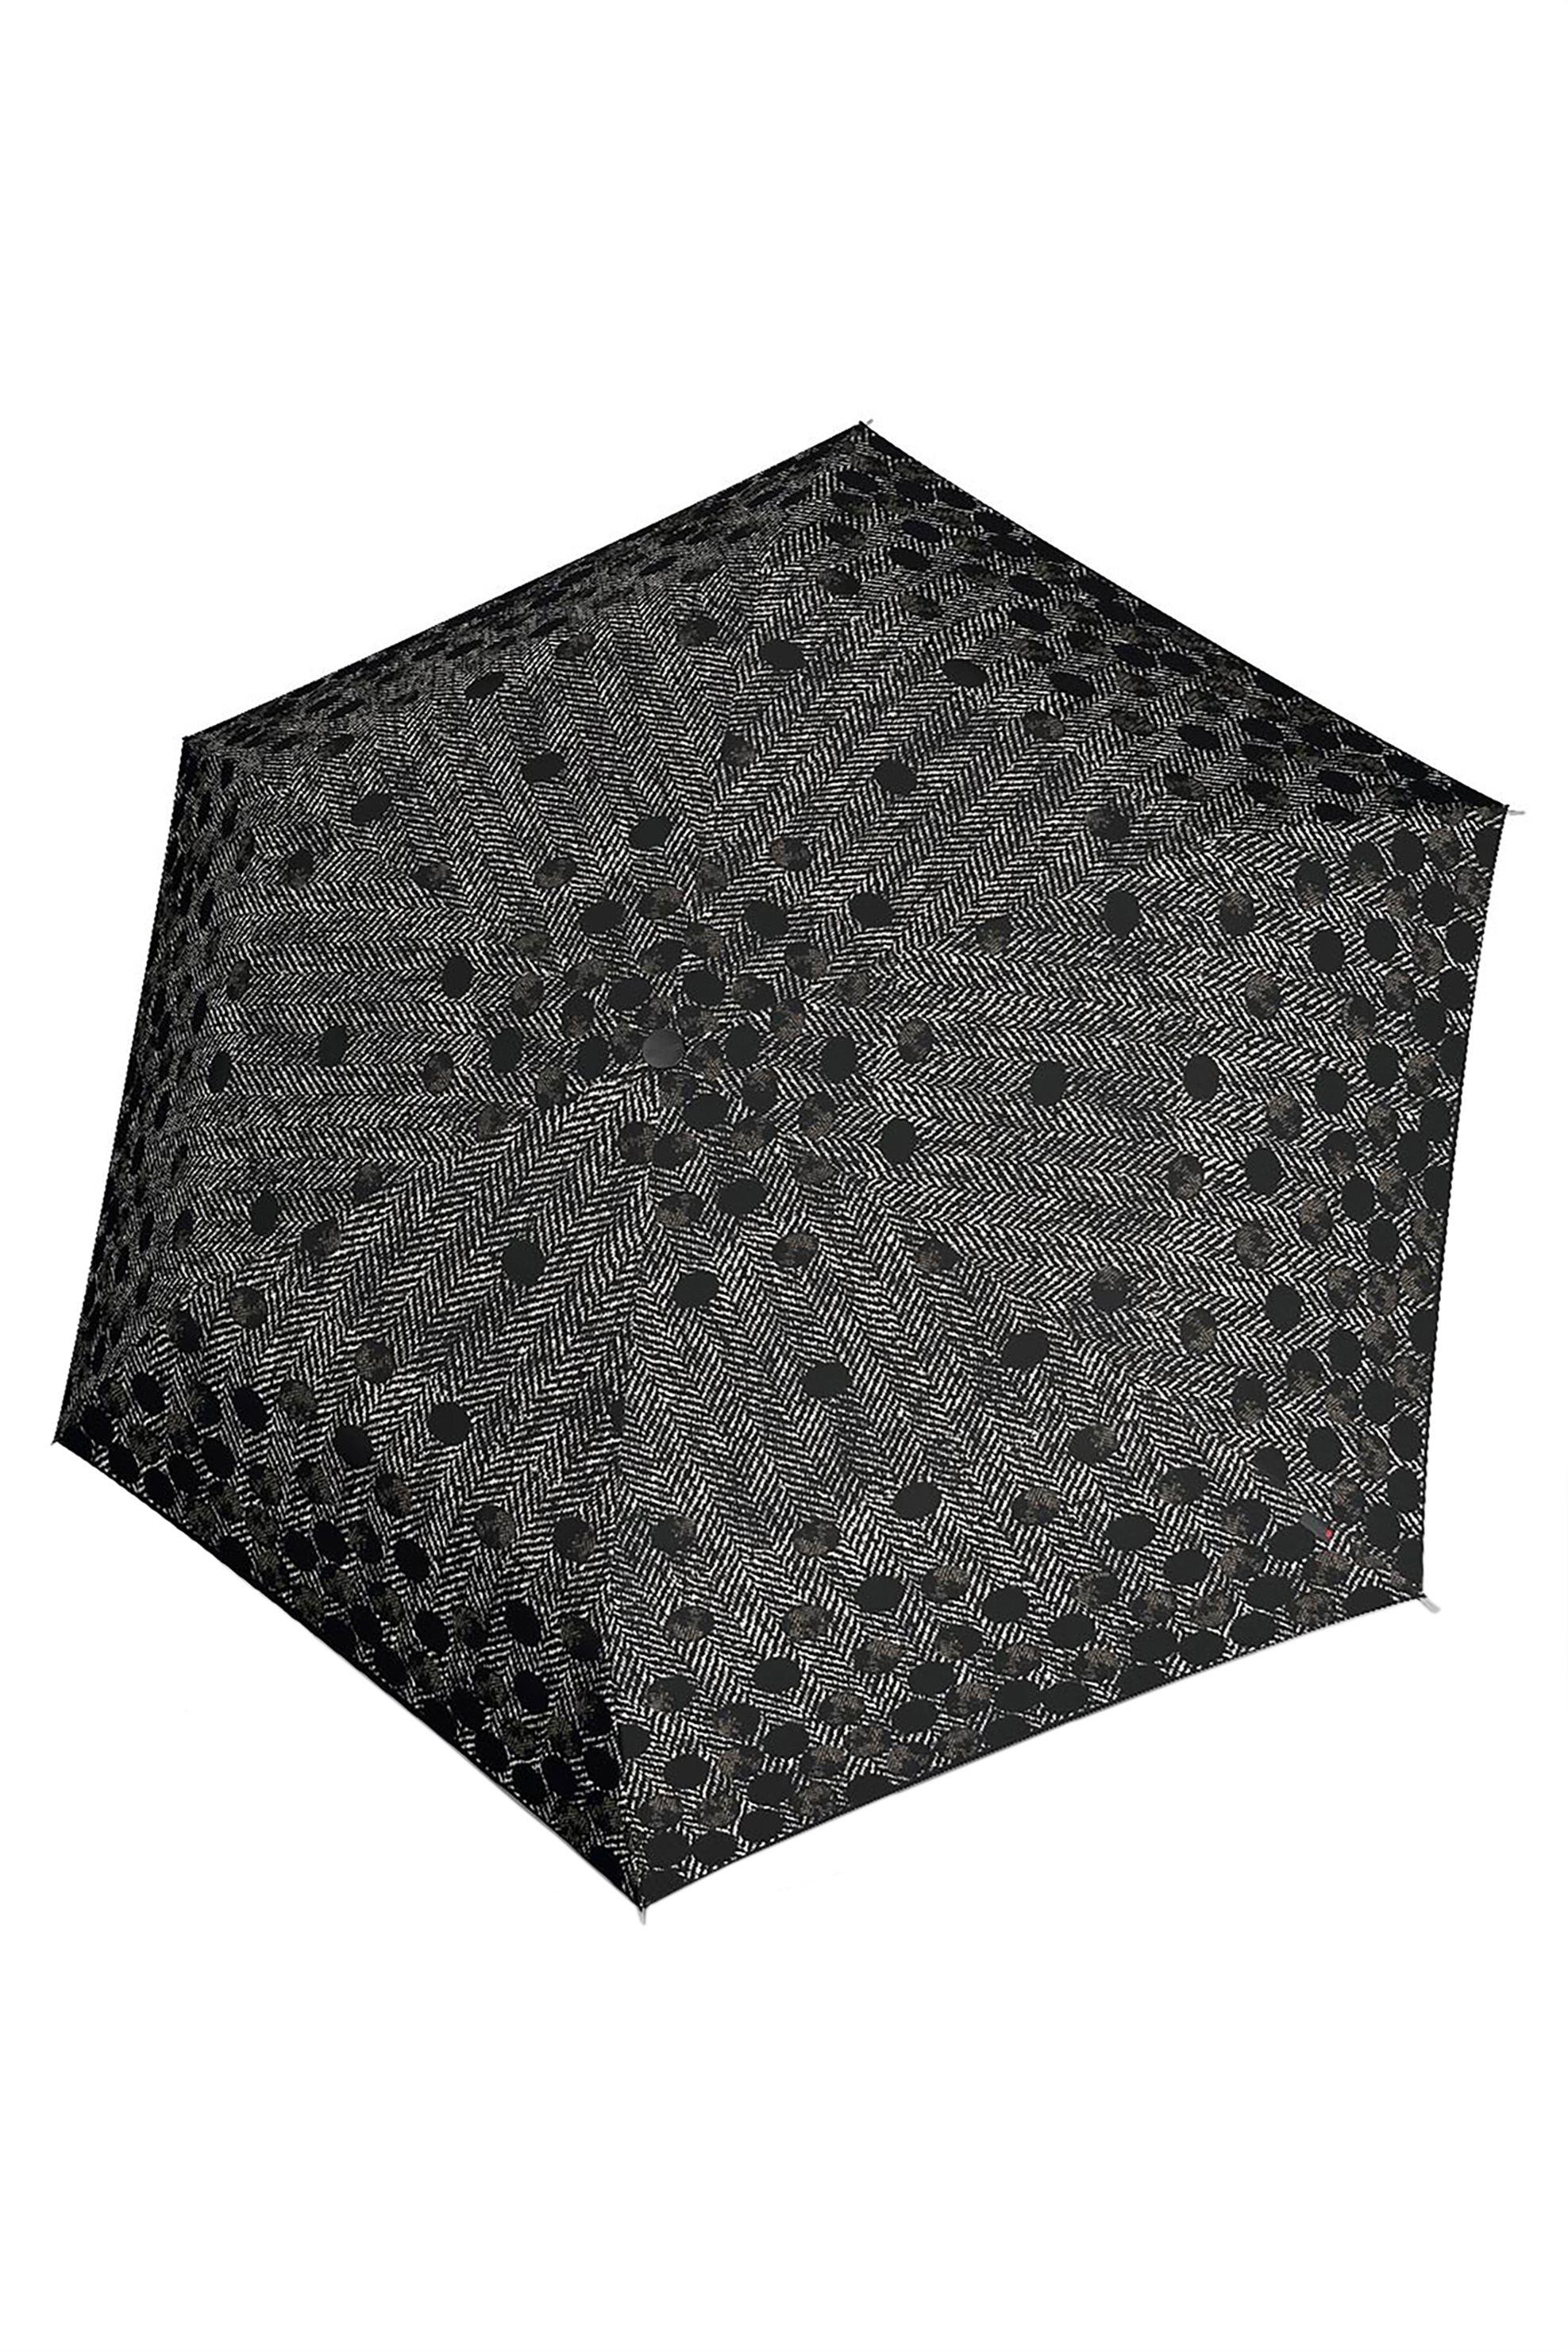 Knirps πτυσσόμενη ομπρέλα με print ''Duomatic'' - KNUM72008399